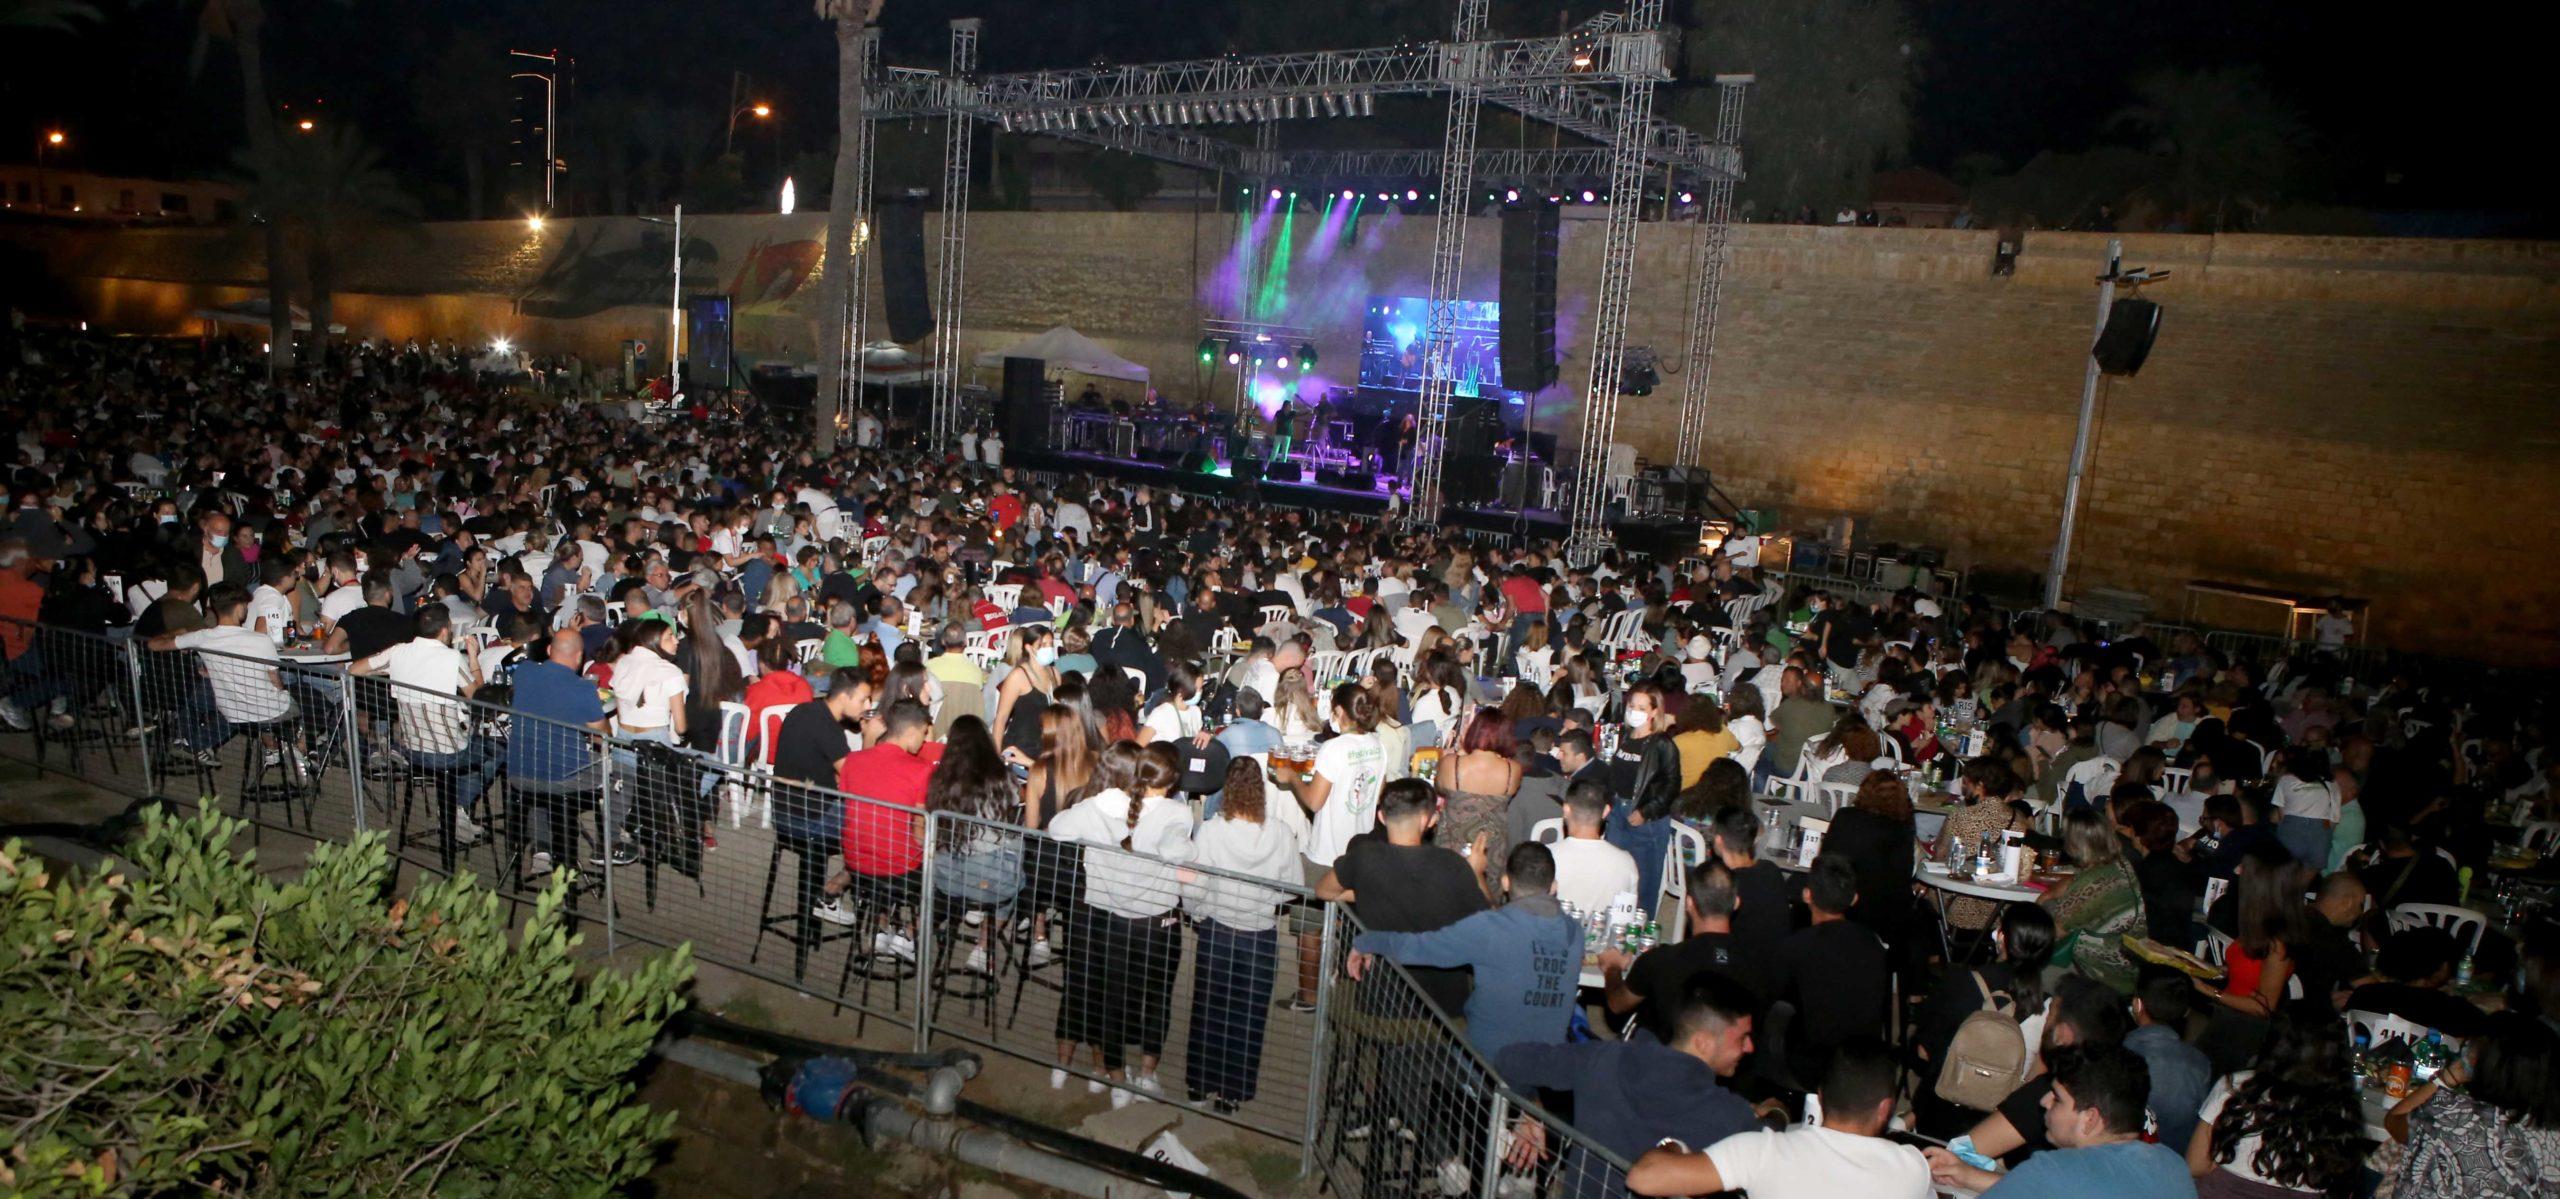 Festival Edon Stefanou Papakonstantinou 17 Scaled